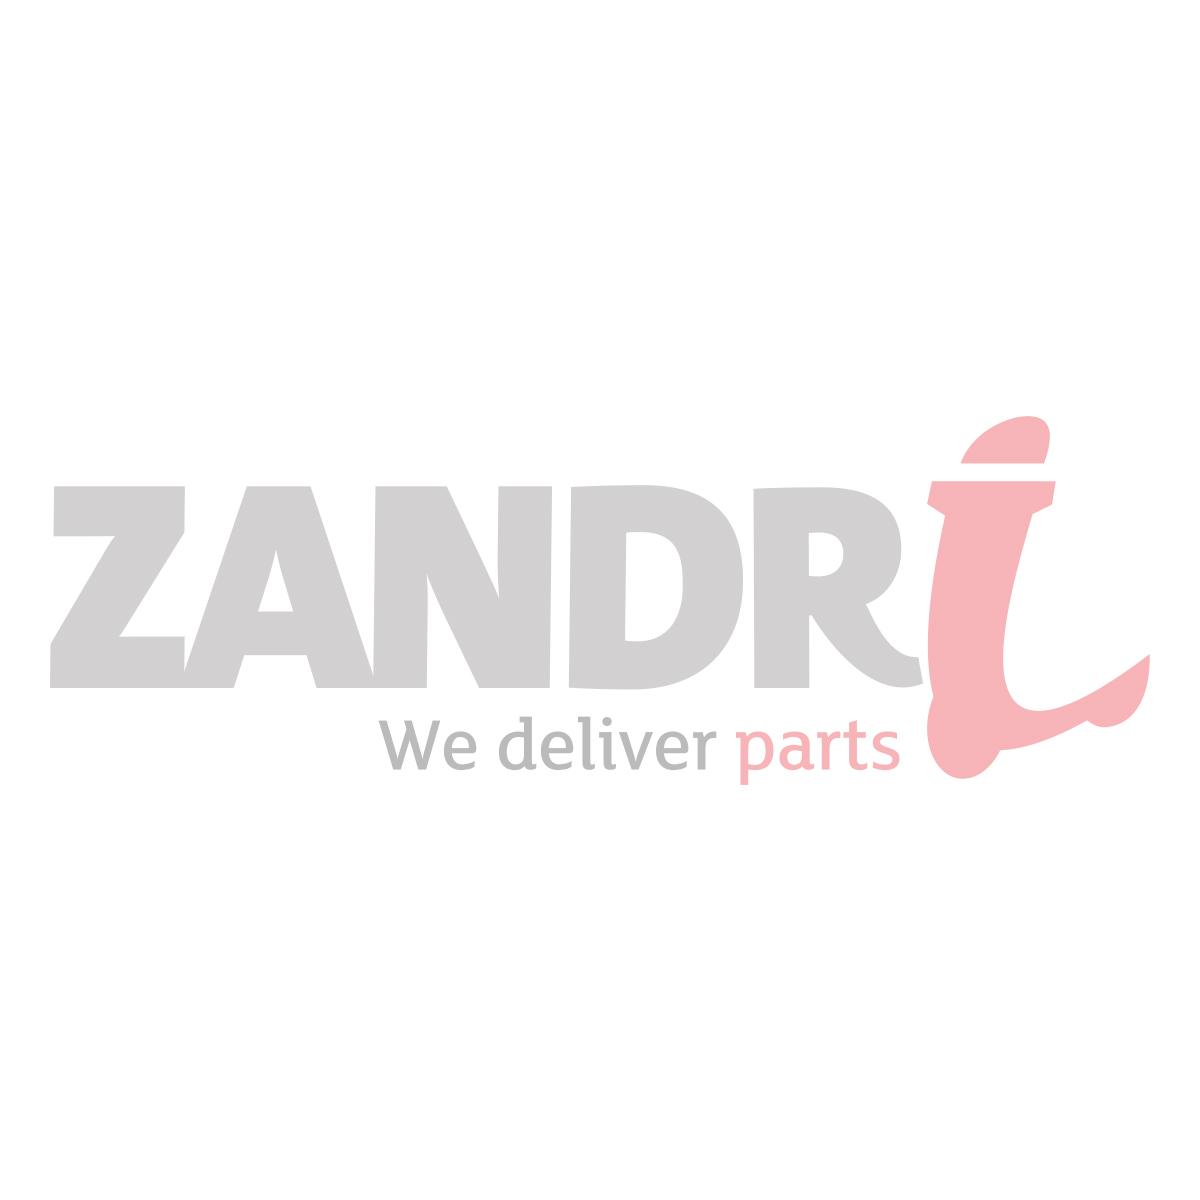 rubber onderstandaard vx50/chi lx/nap